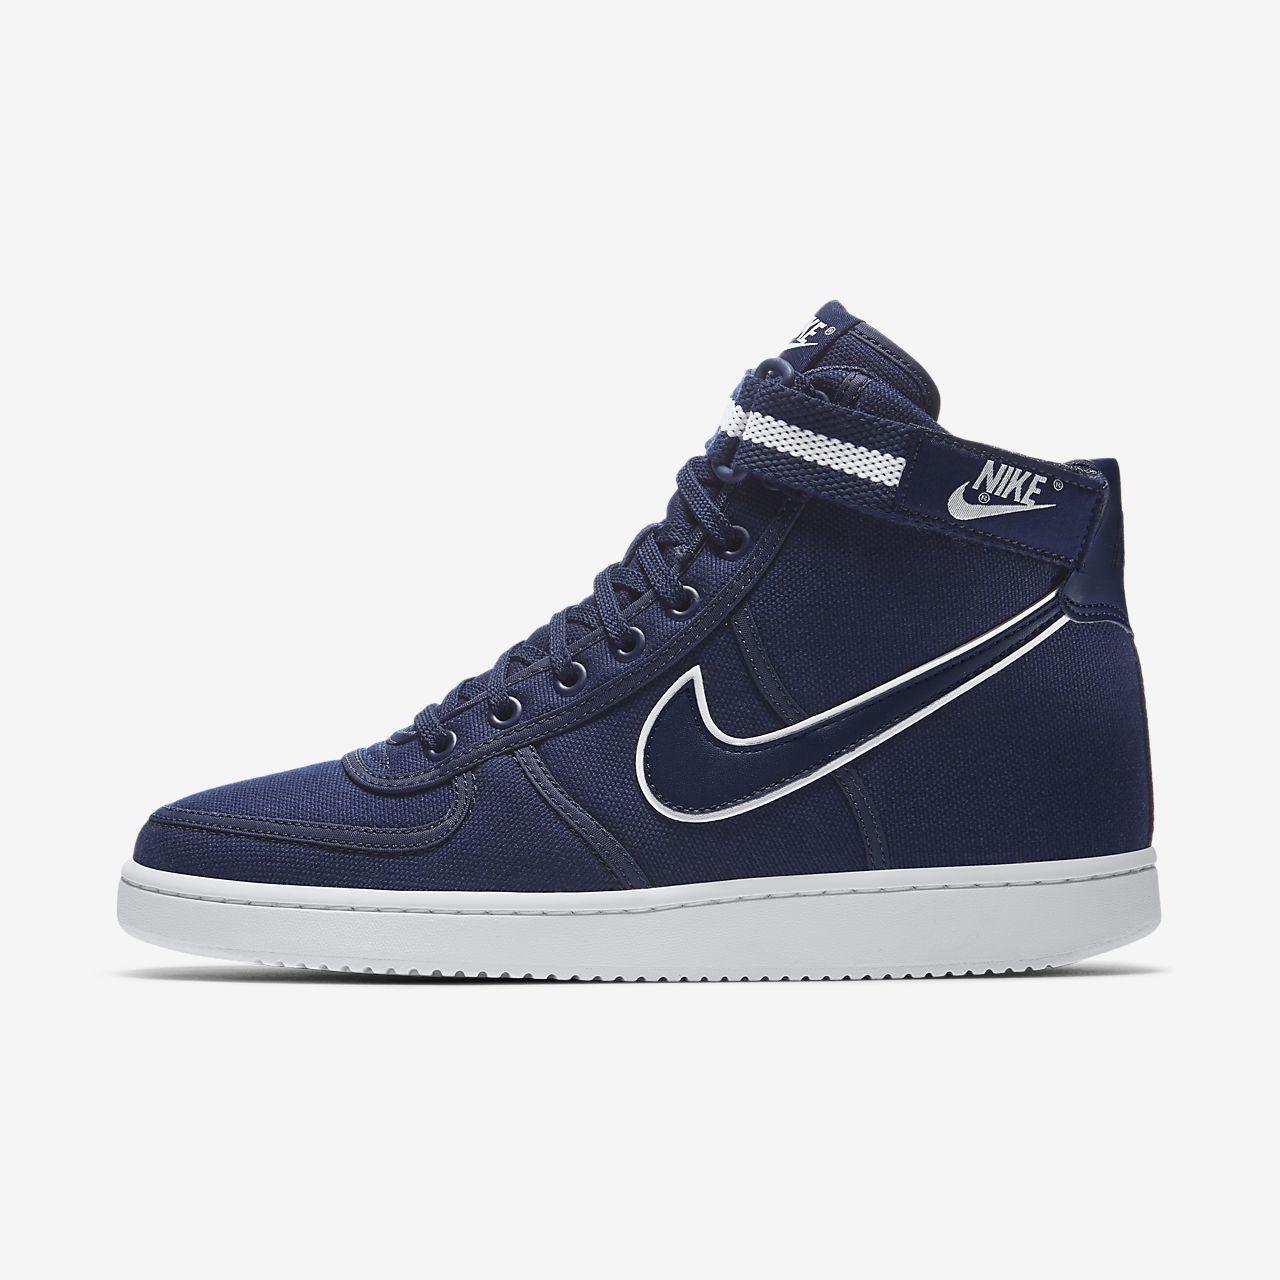 Nike Vandal High Supreme Men's Lifestyle Shoes Black/White/Grey jU9057H